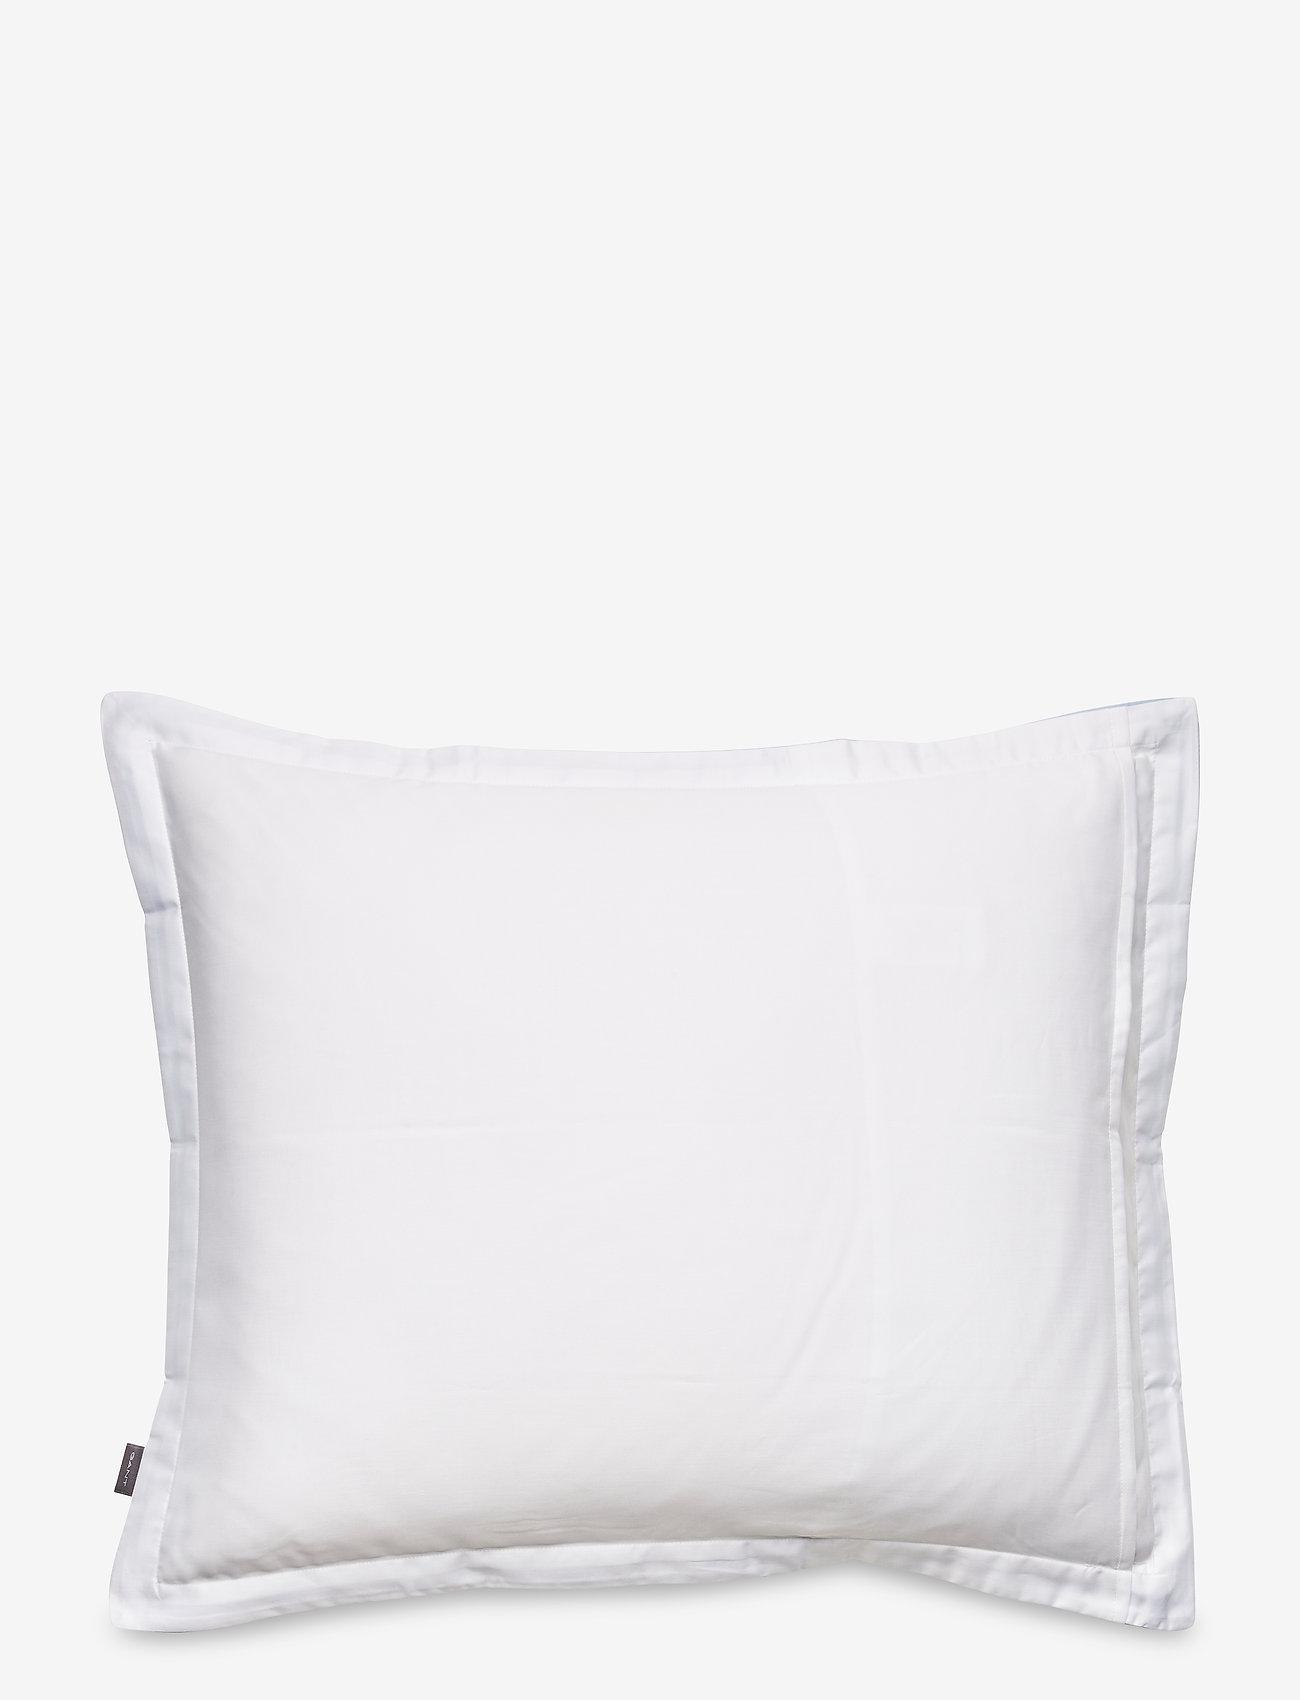 GANT - SATEEN BORDER PILLOWCASE - pillowcases - hamptons blue - 1